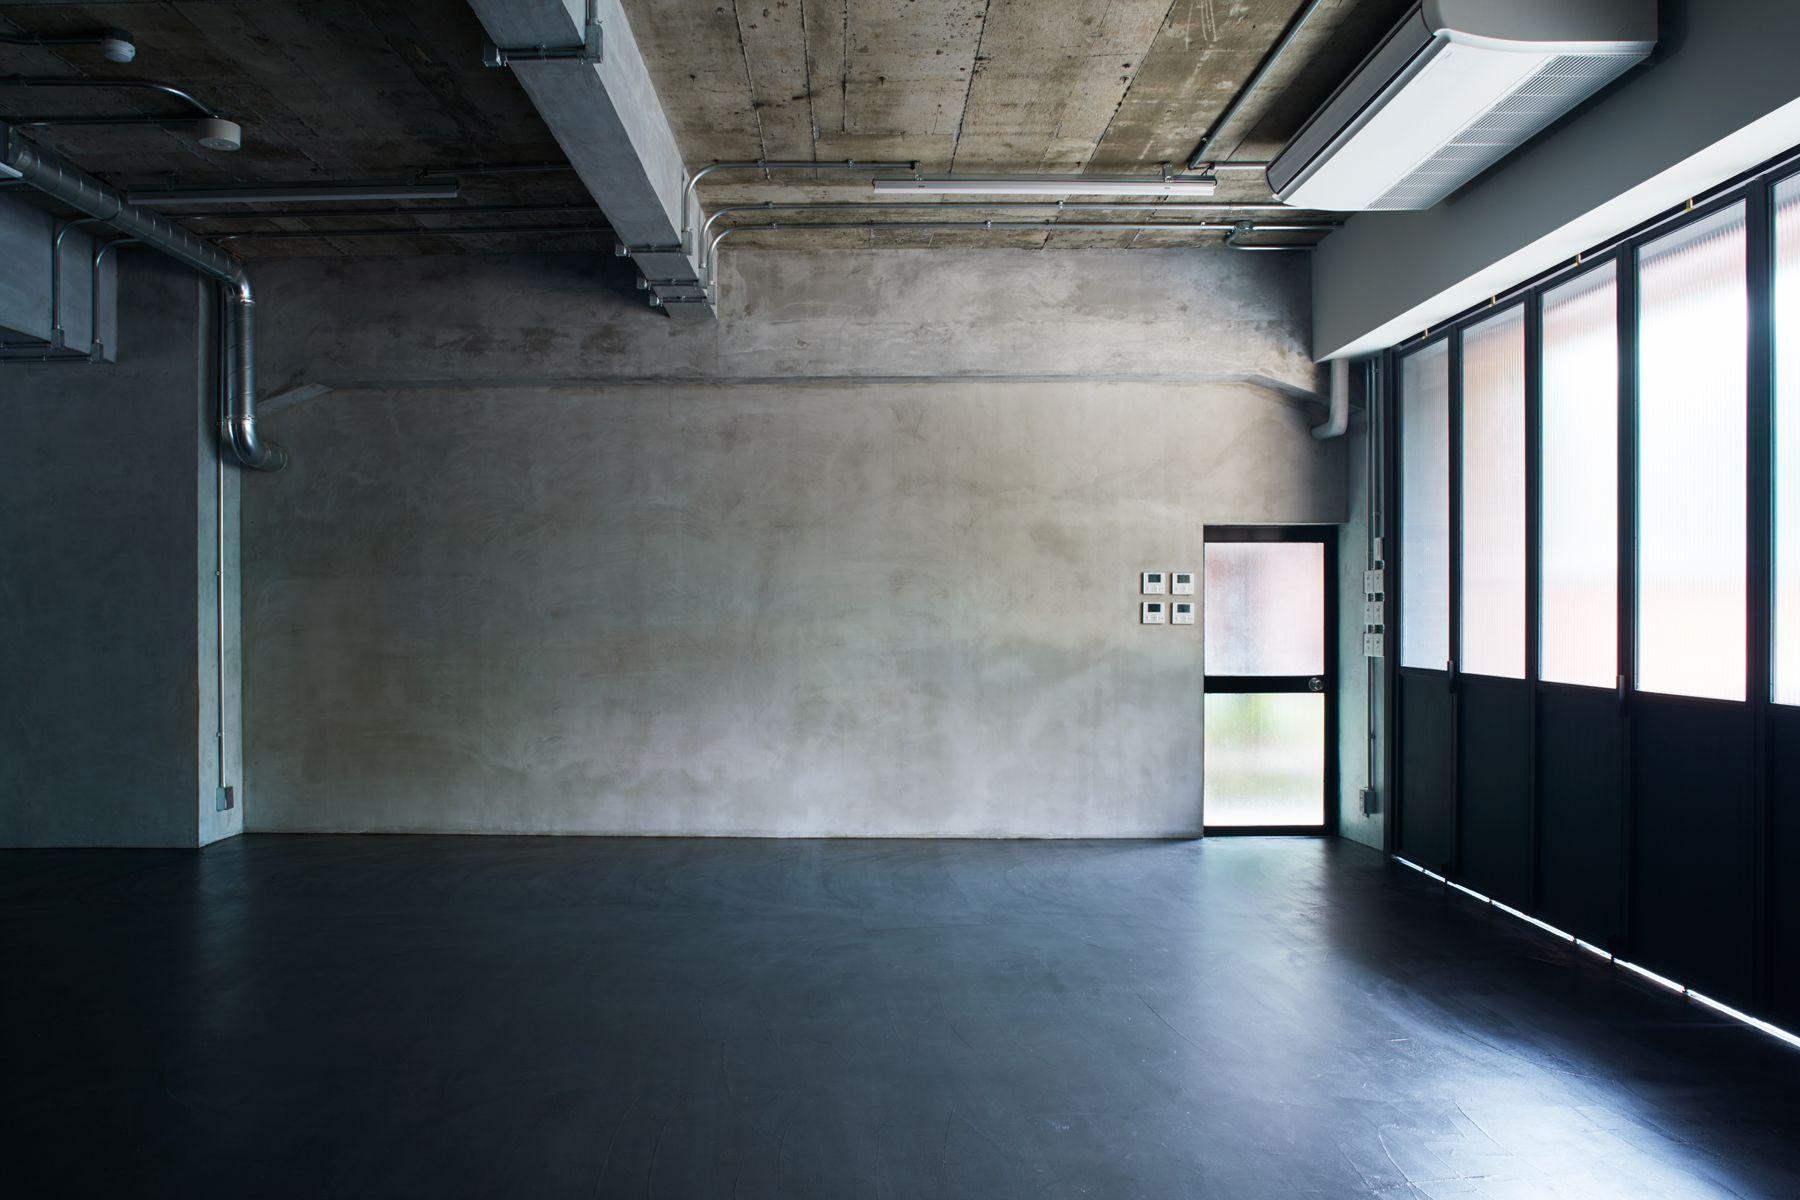 noru studio (ノル スタジオ)スタジオ内・モルタル壁